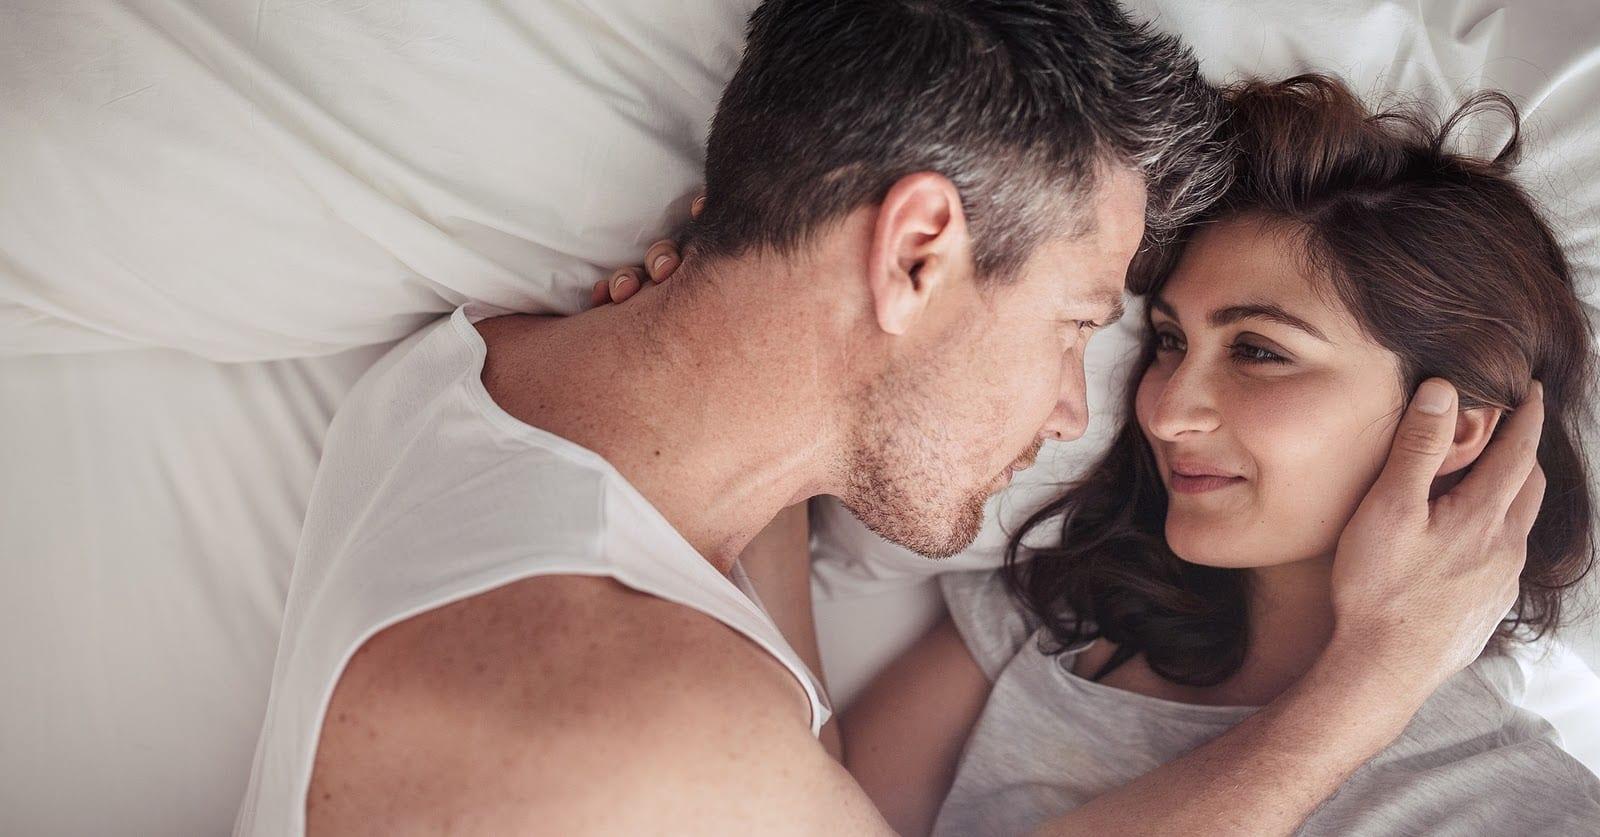 heterosexual couple in laying in bed